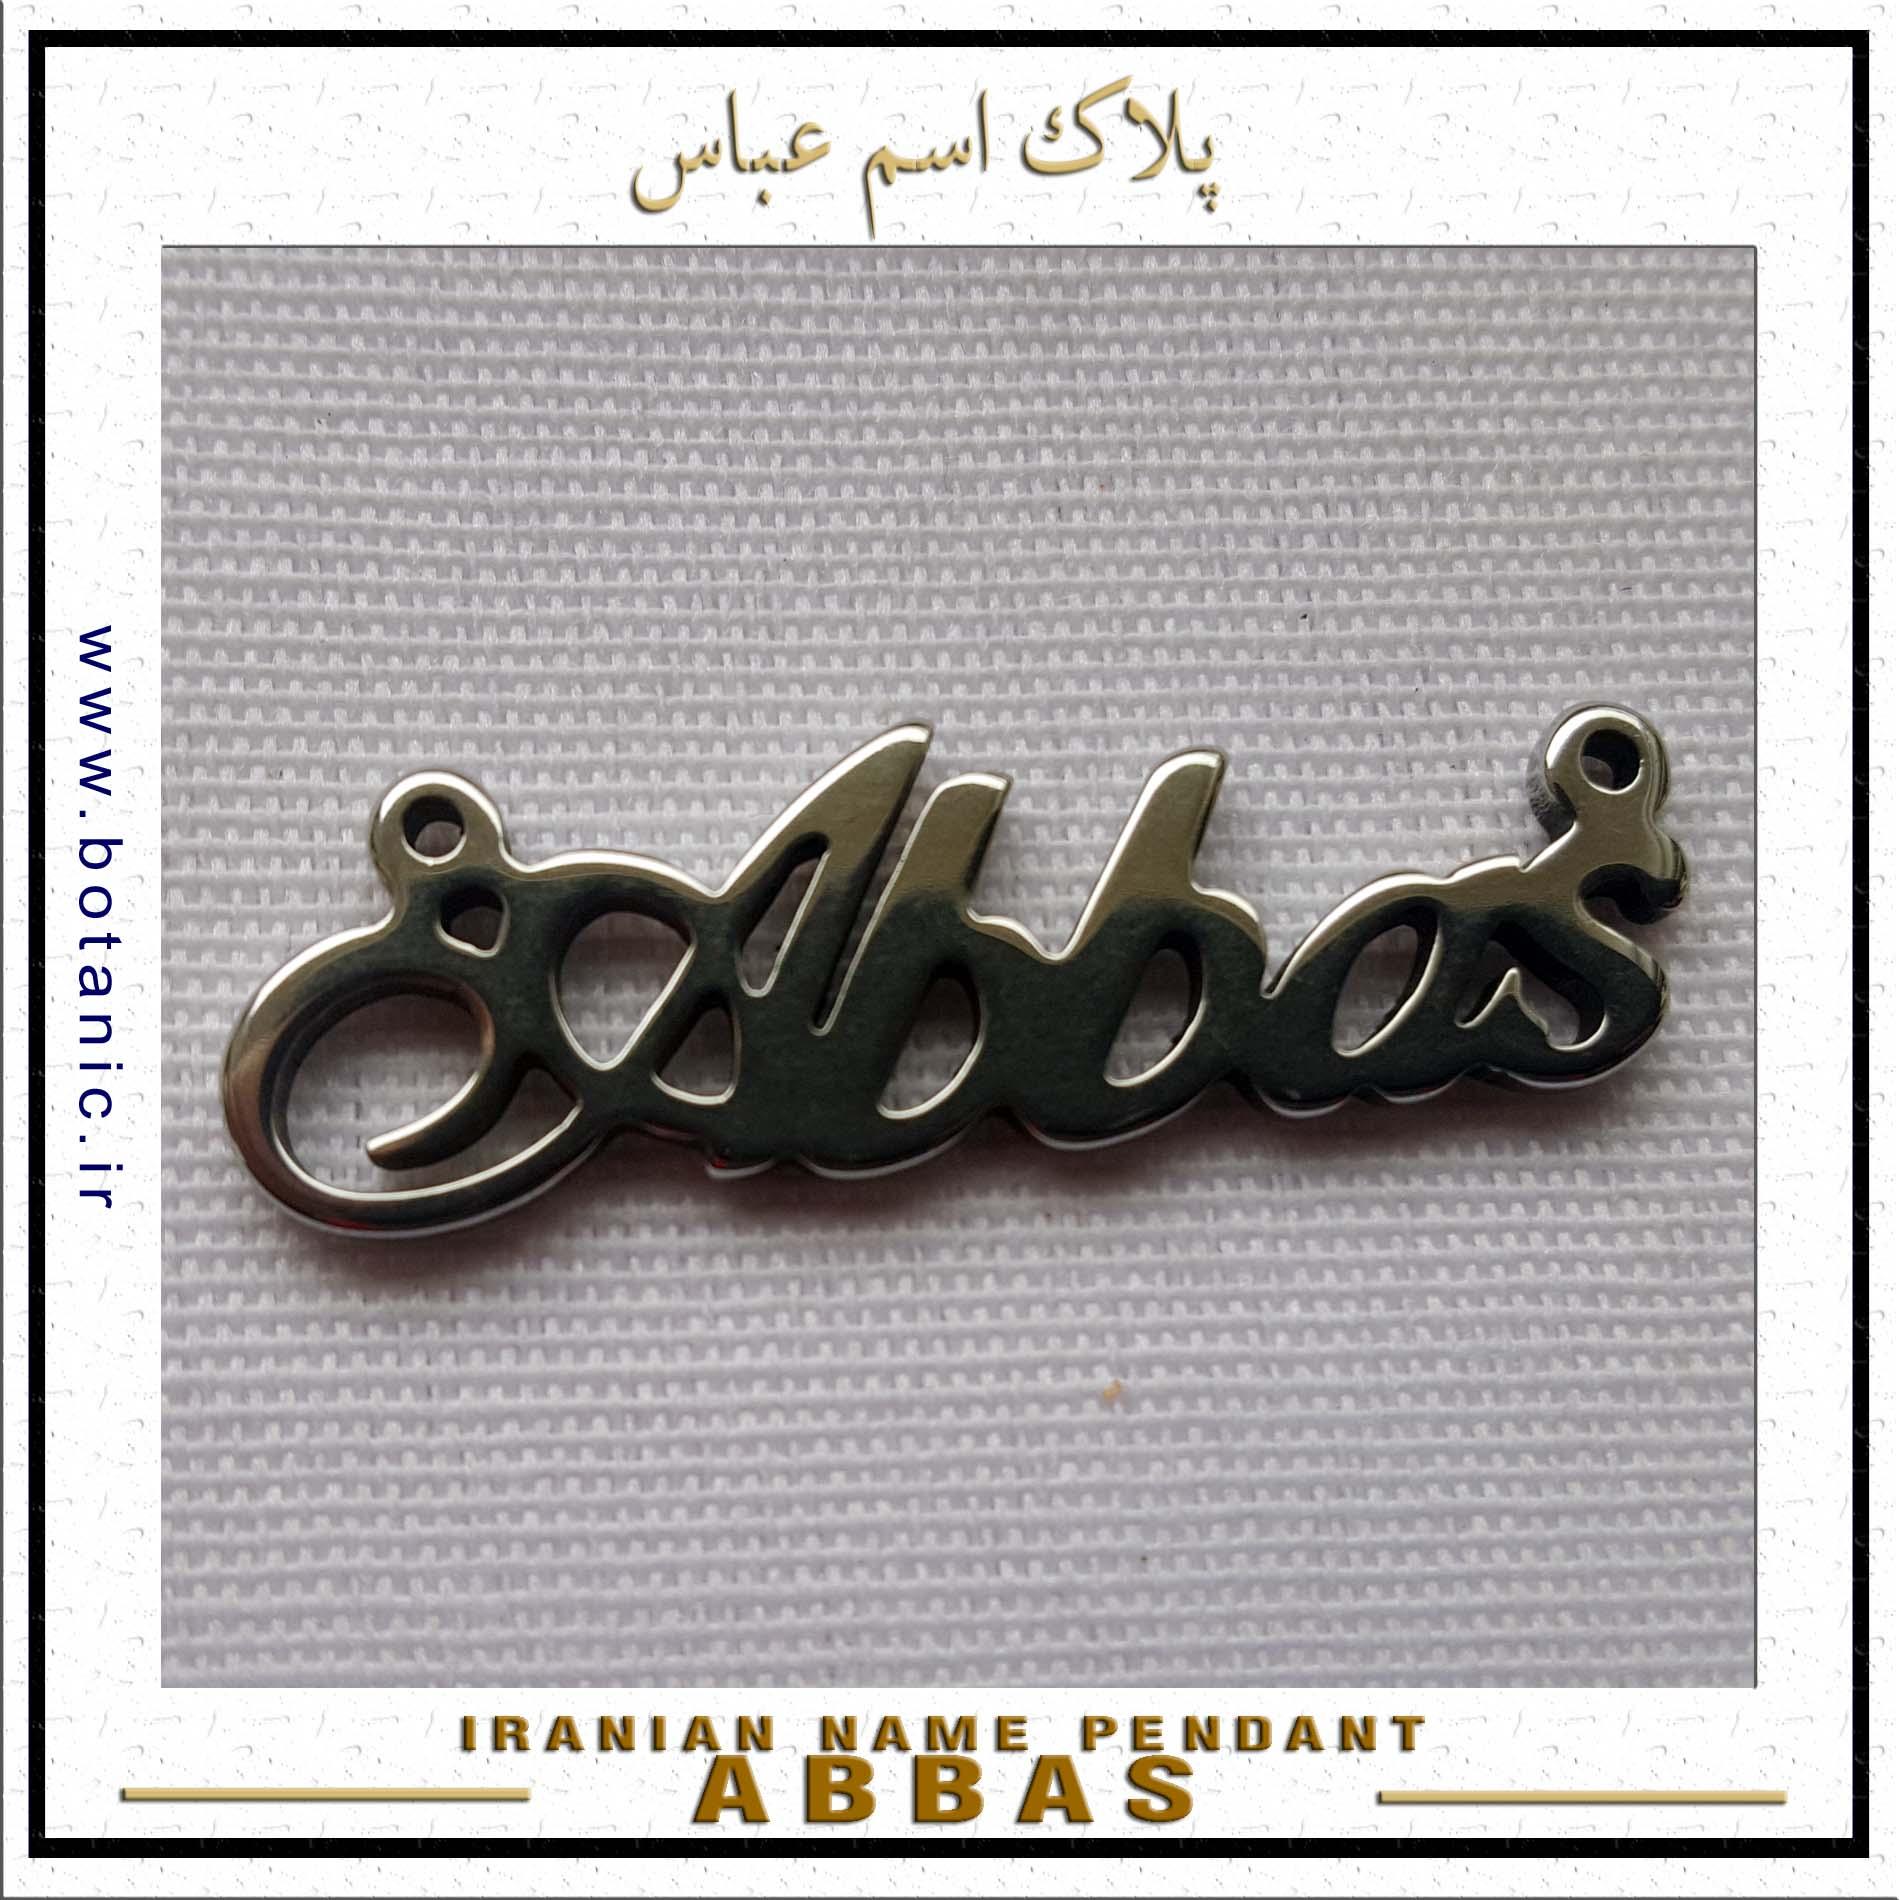 Iranian Name Pendant Abbas